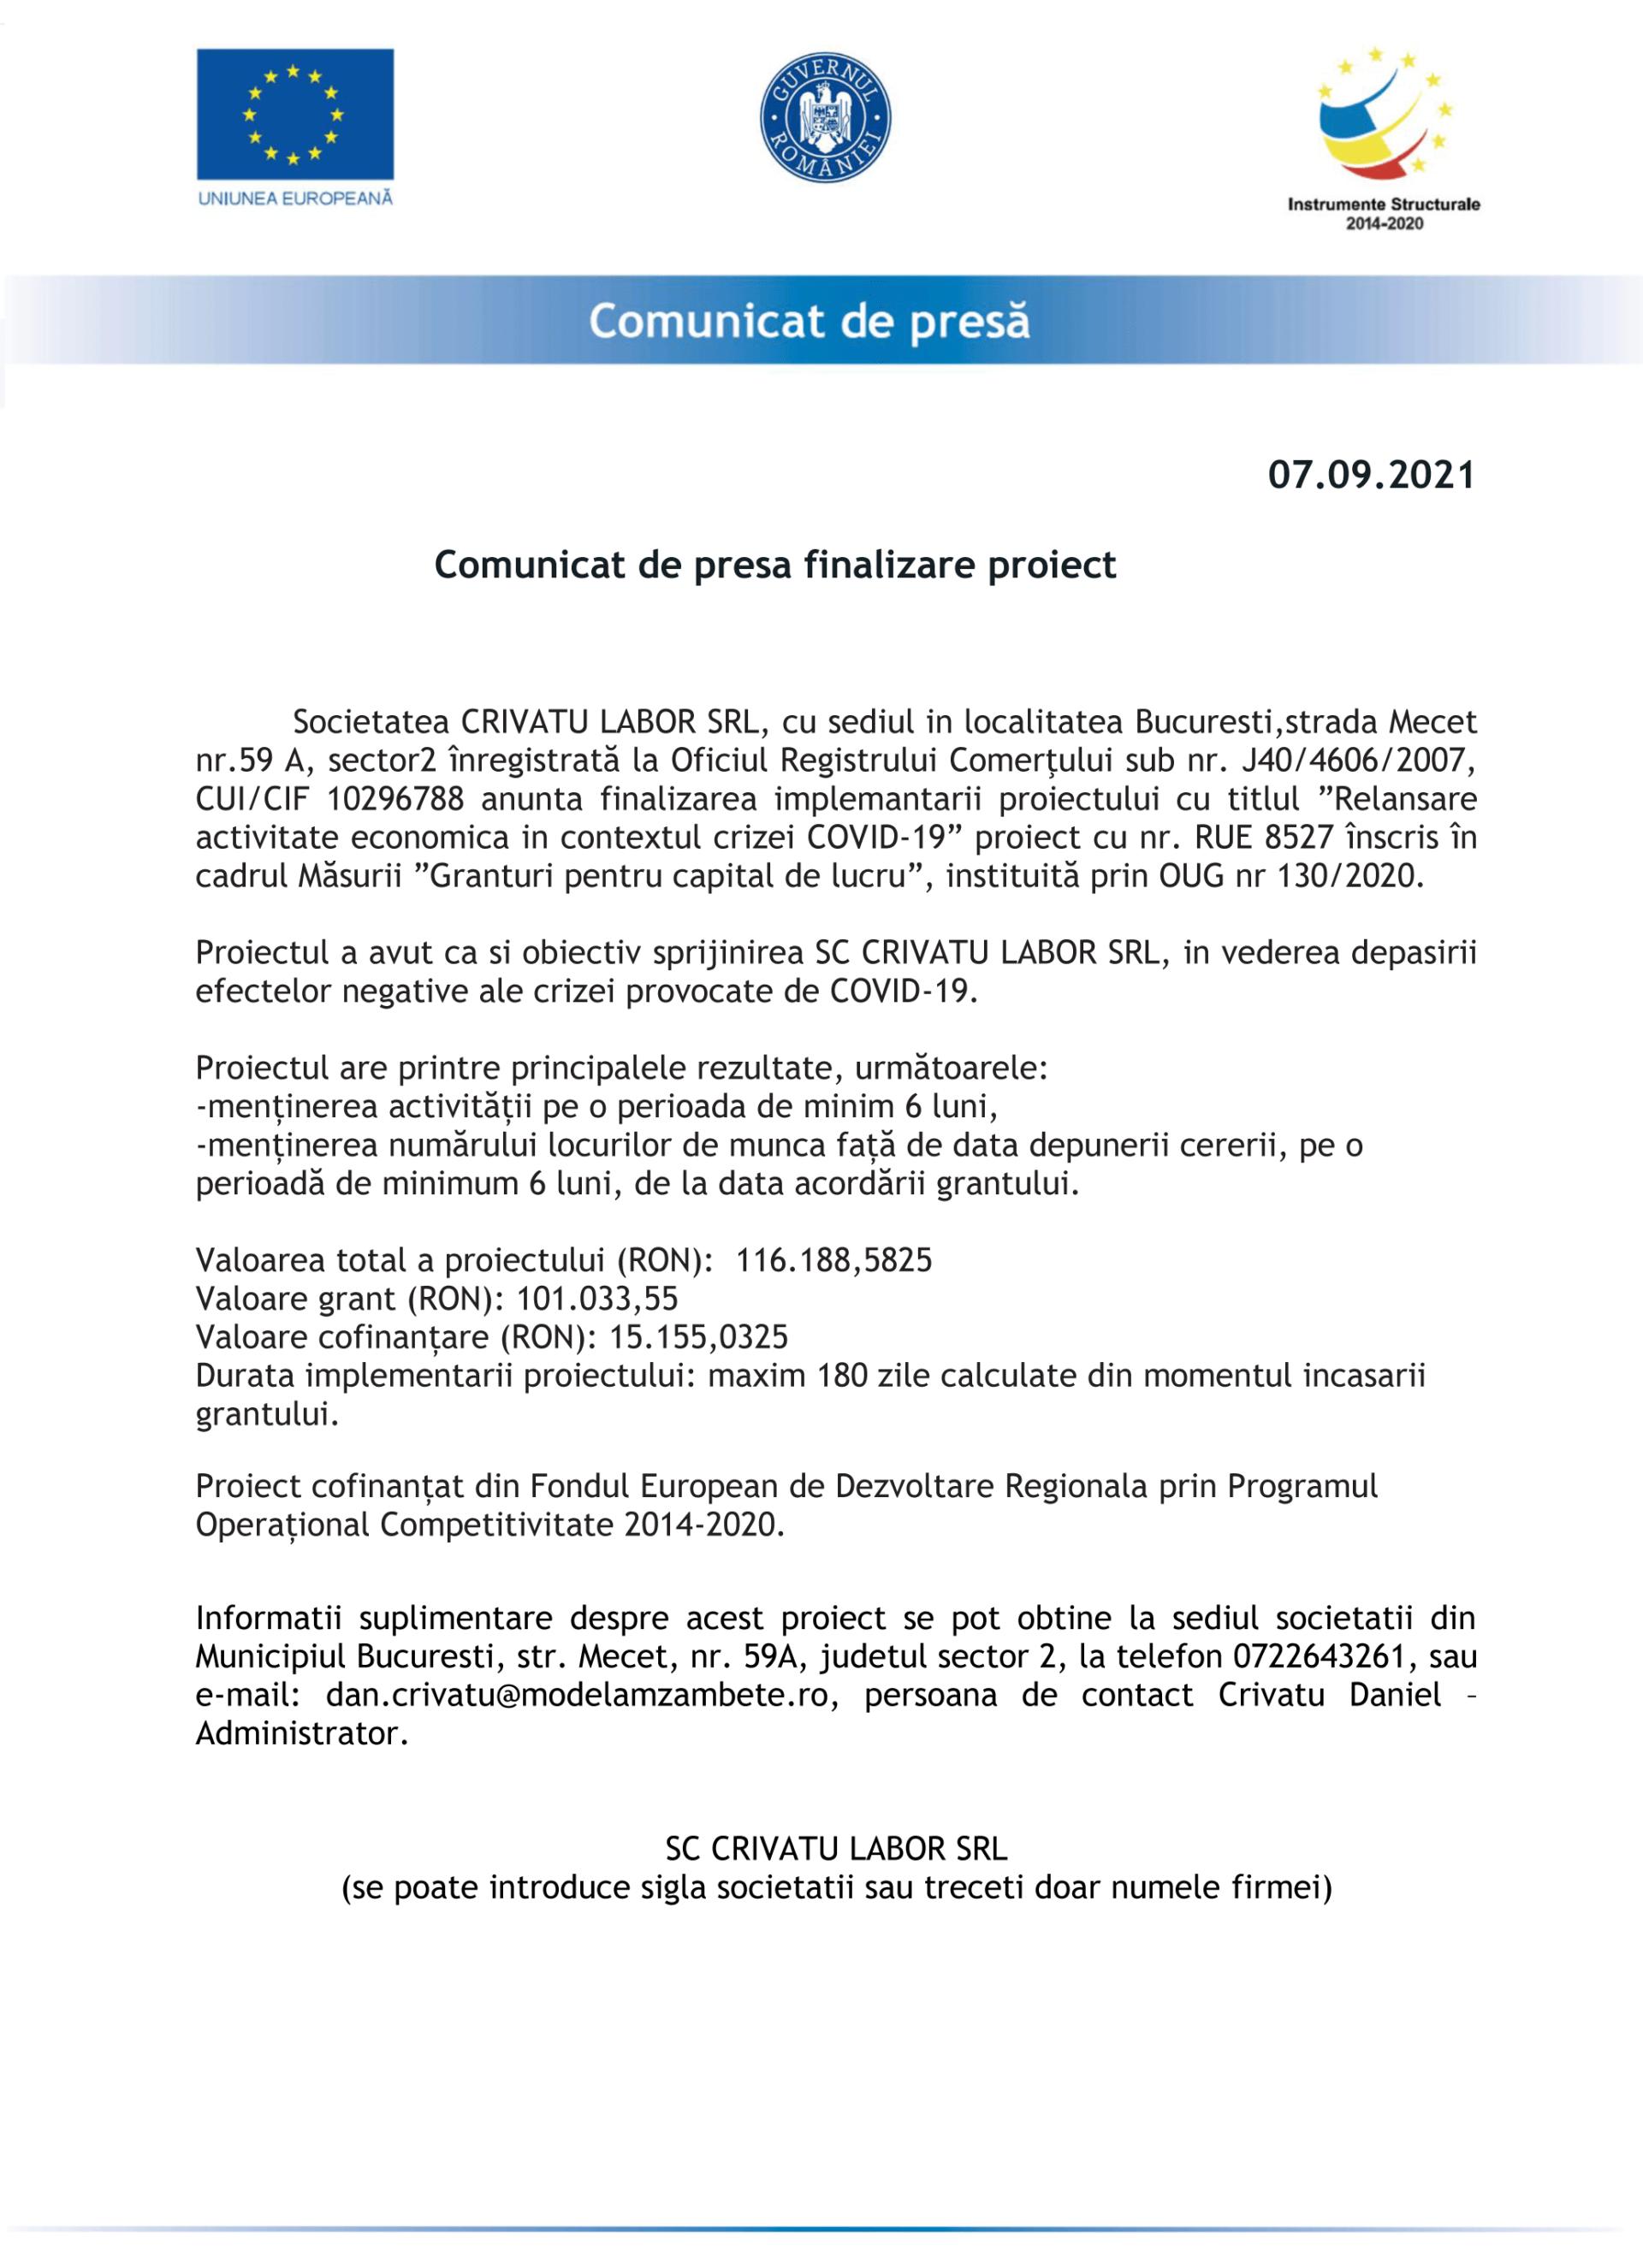 Comunicat-finalizare-proiect-(granturi)-Crivatu-Labor